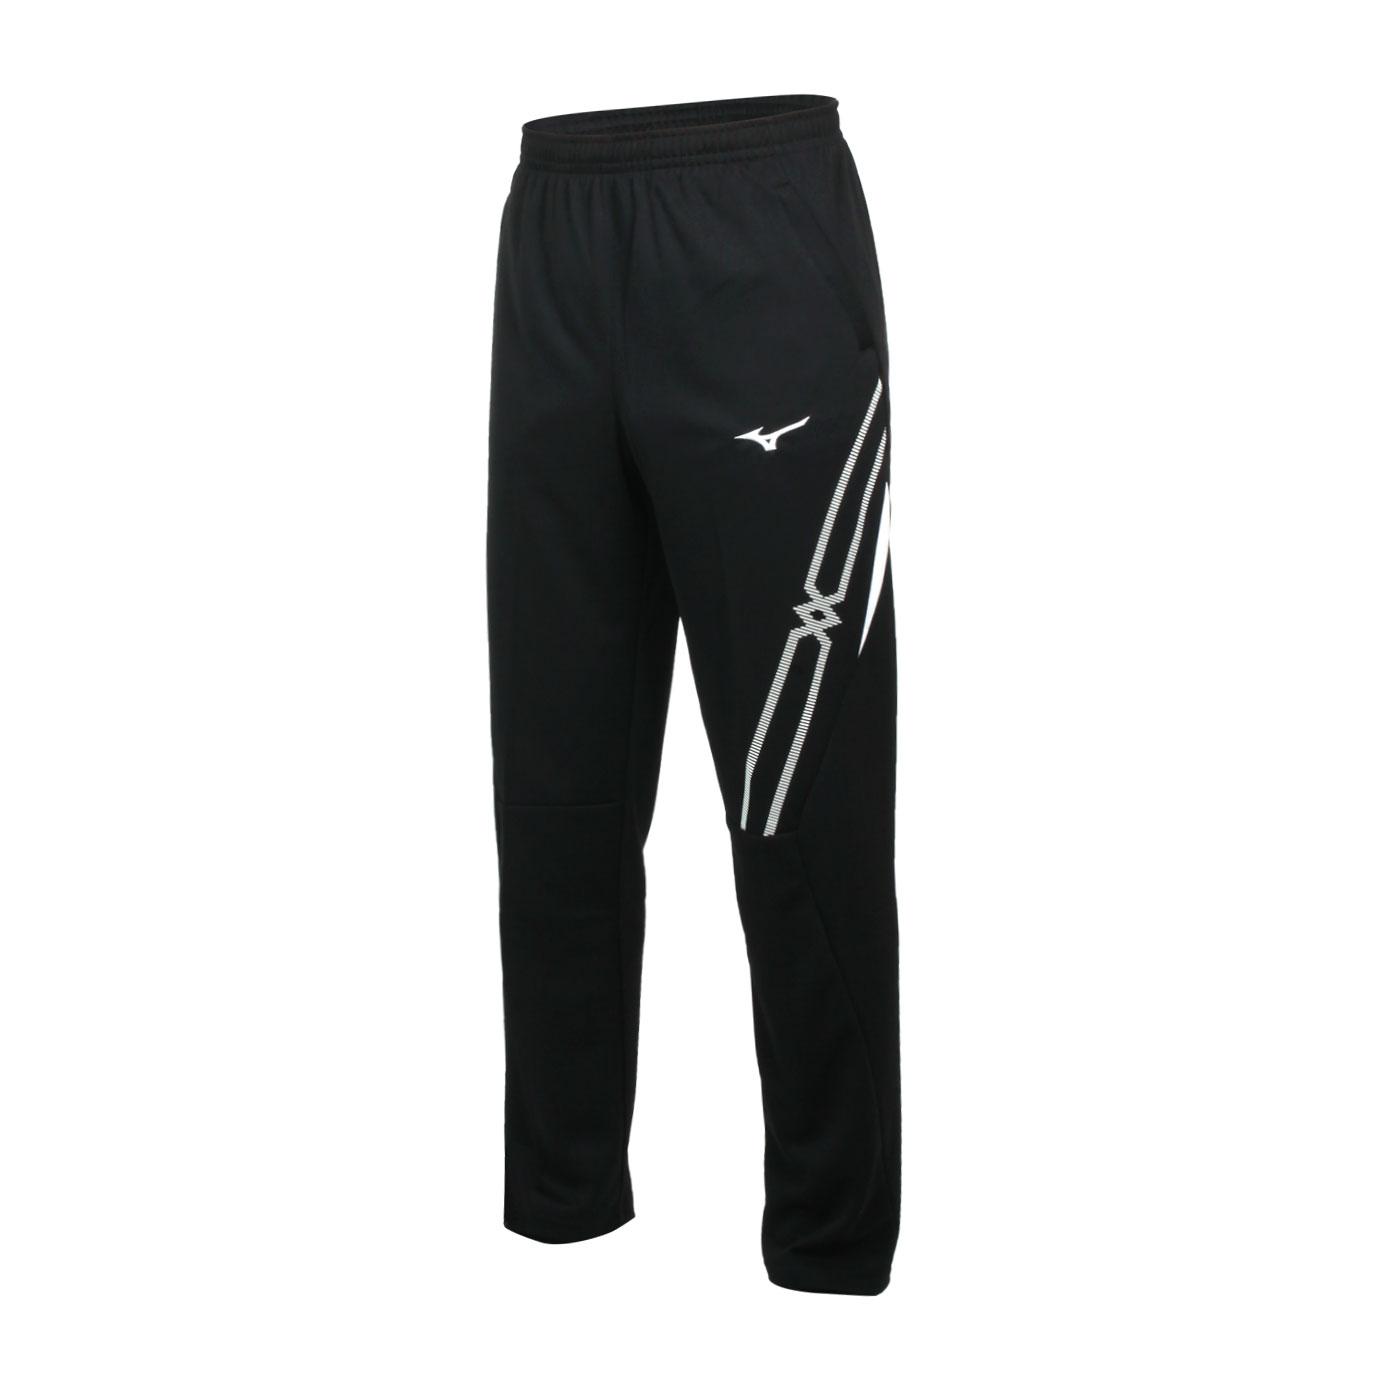 MIZUNO 男款針織長褲 32TD103390 - 黑白